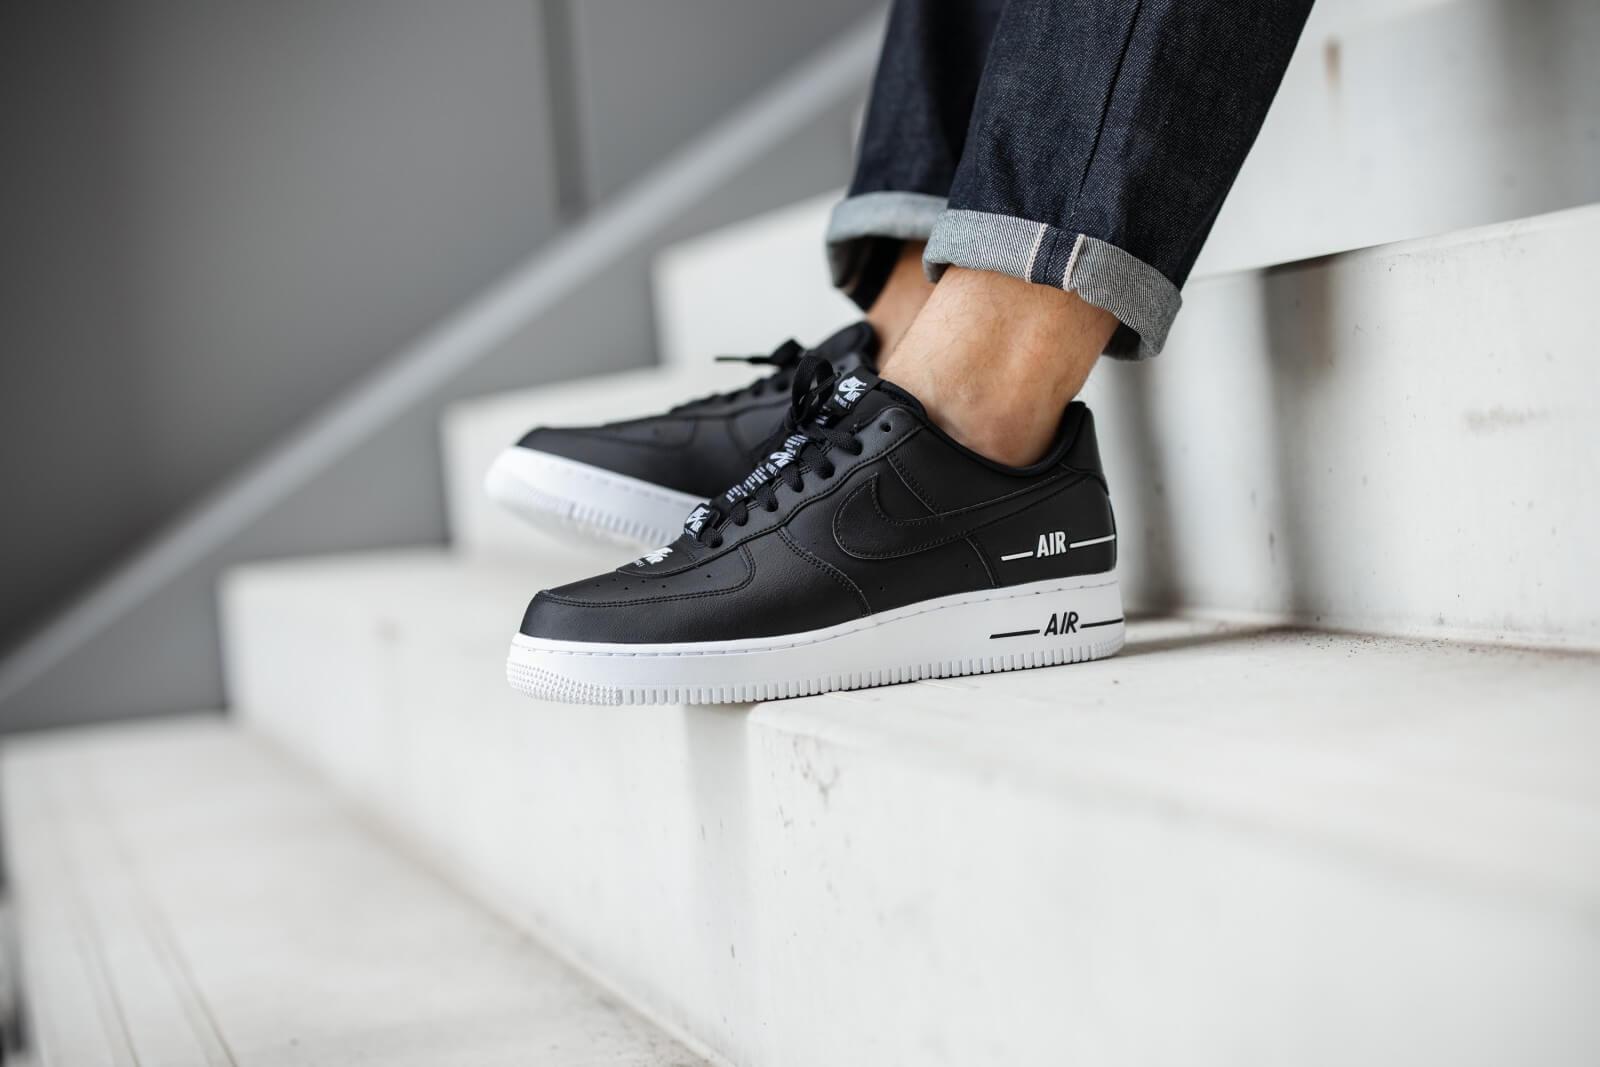 Nike Air Force 1 07 LV8 3 Black/White